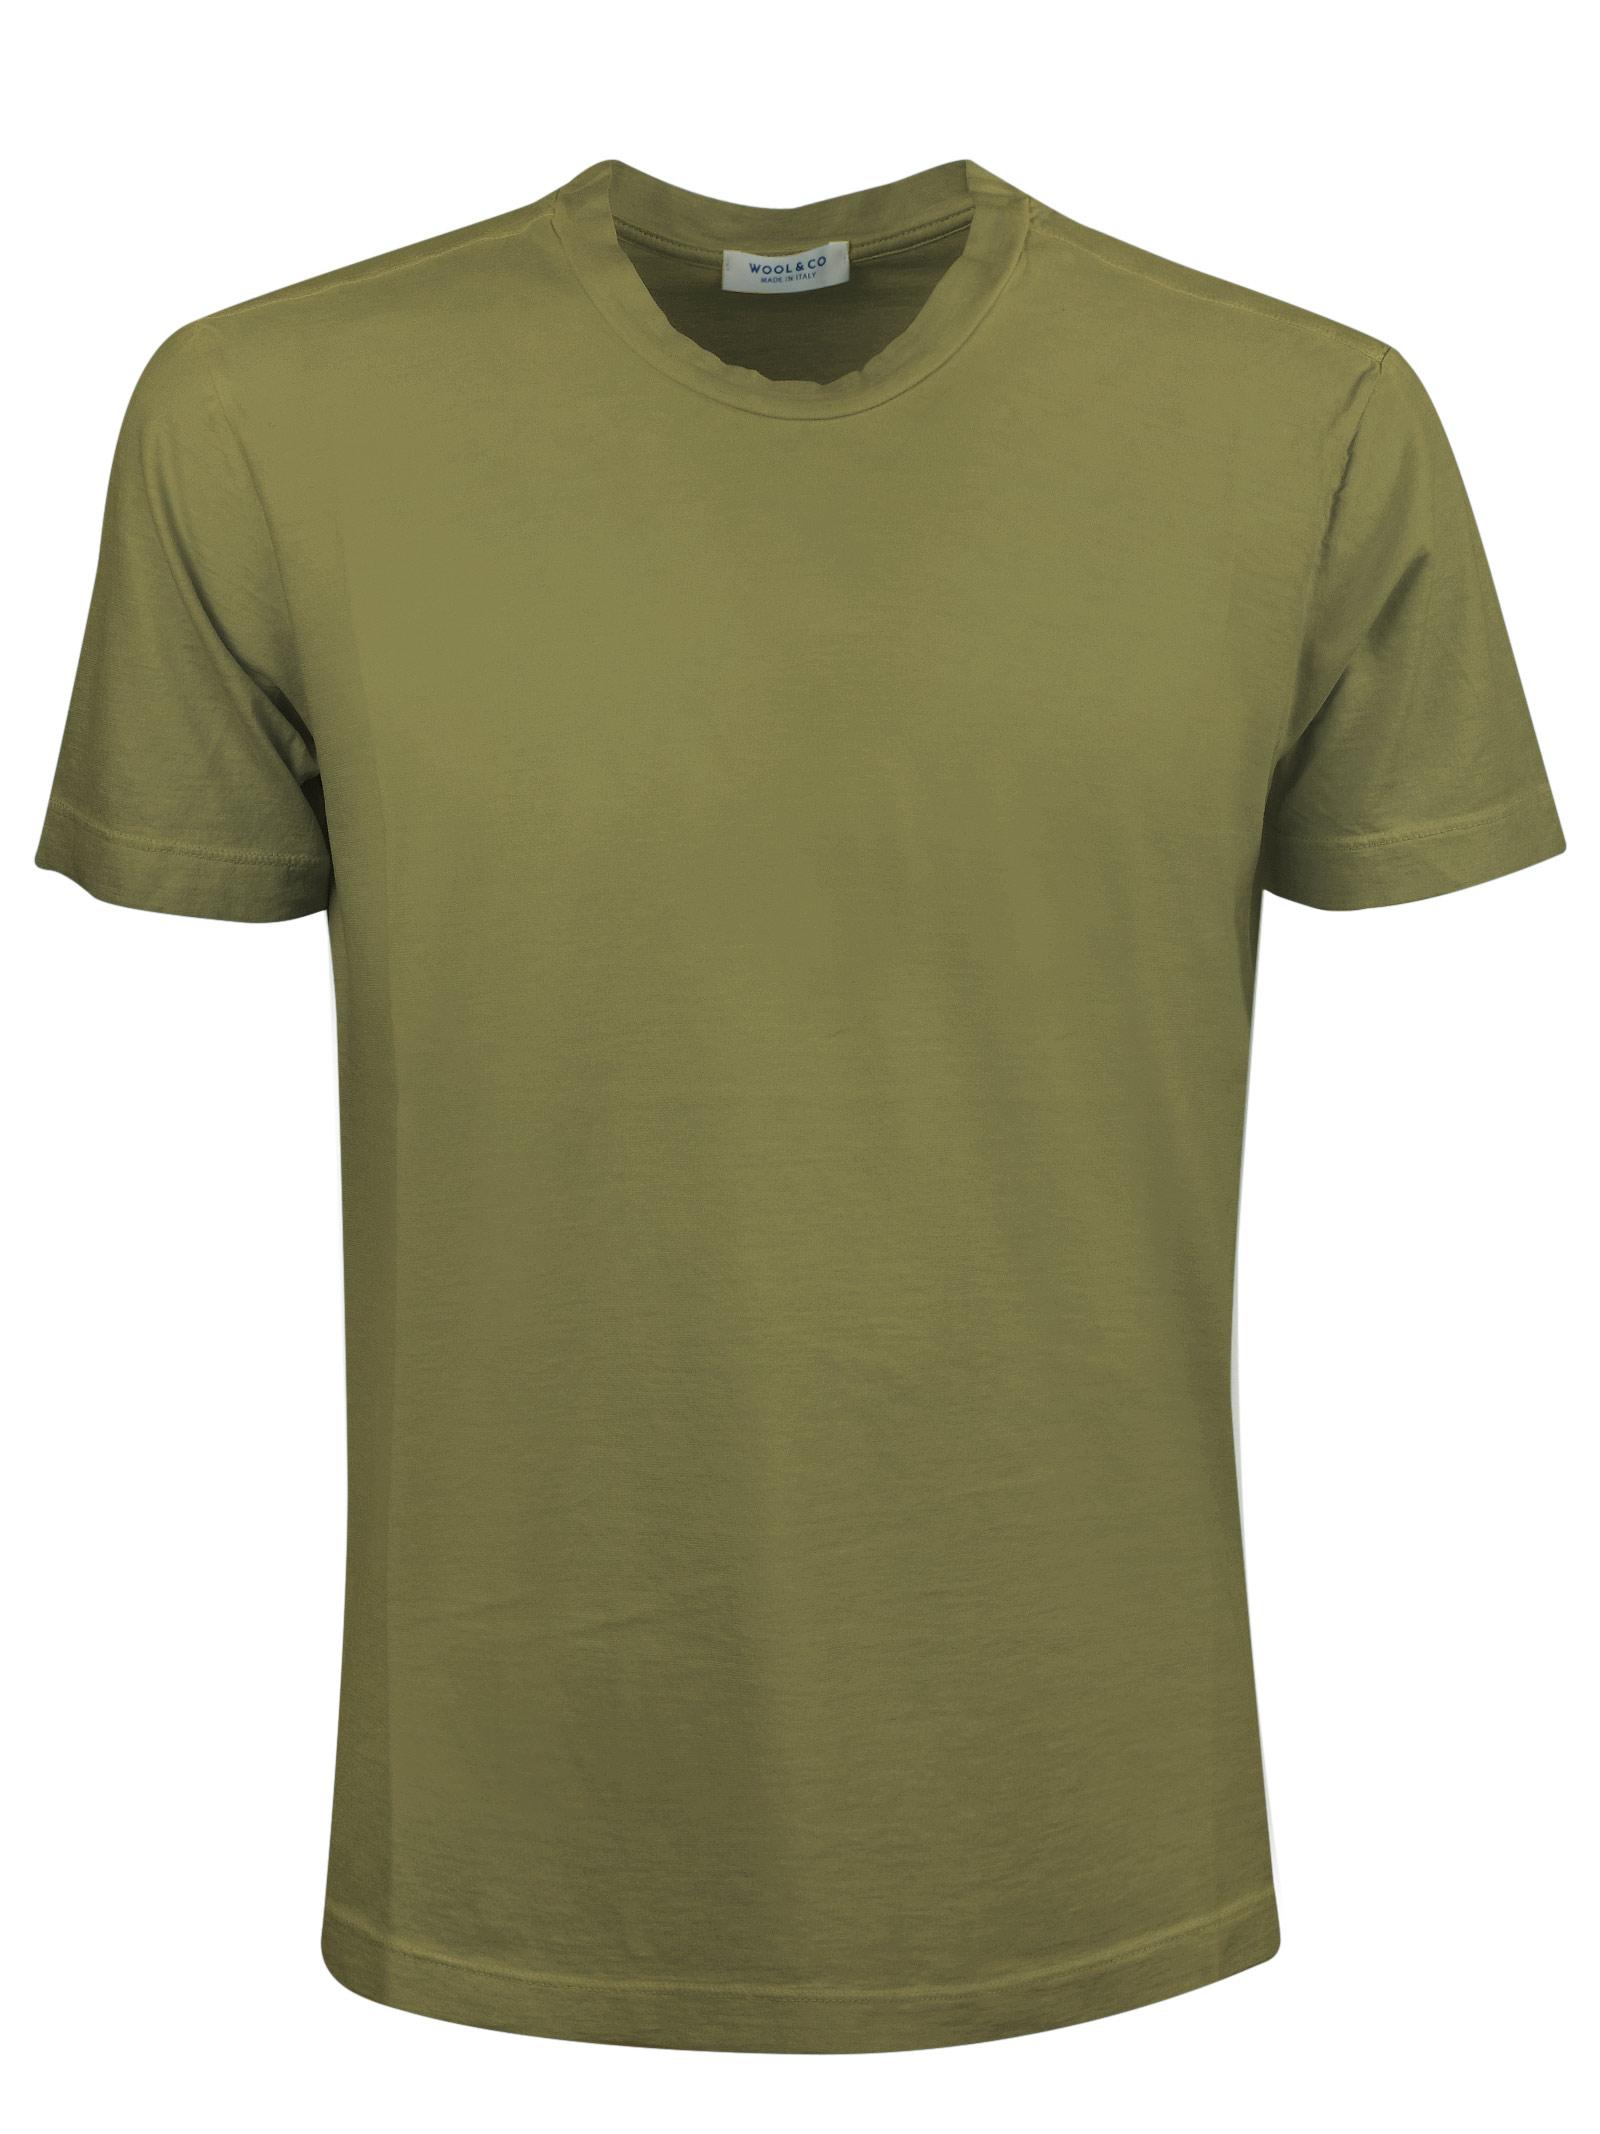 T- Shirt in cotone WOOL & CO. | T- shirt | 23450048